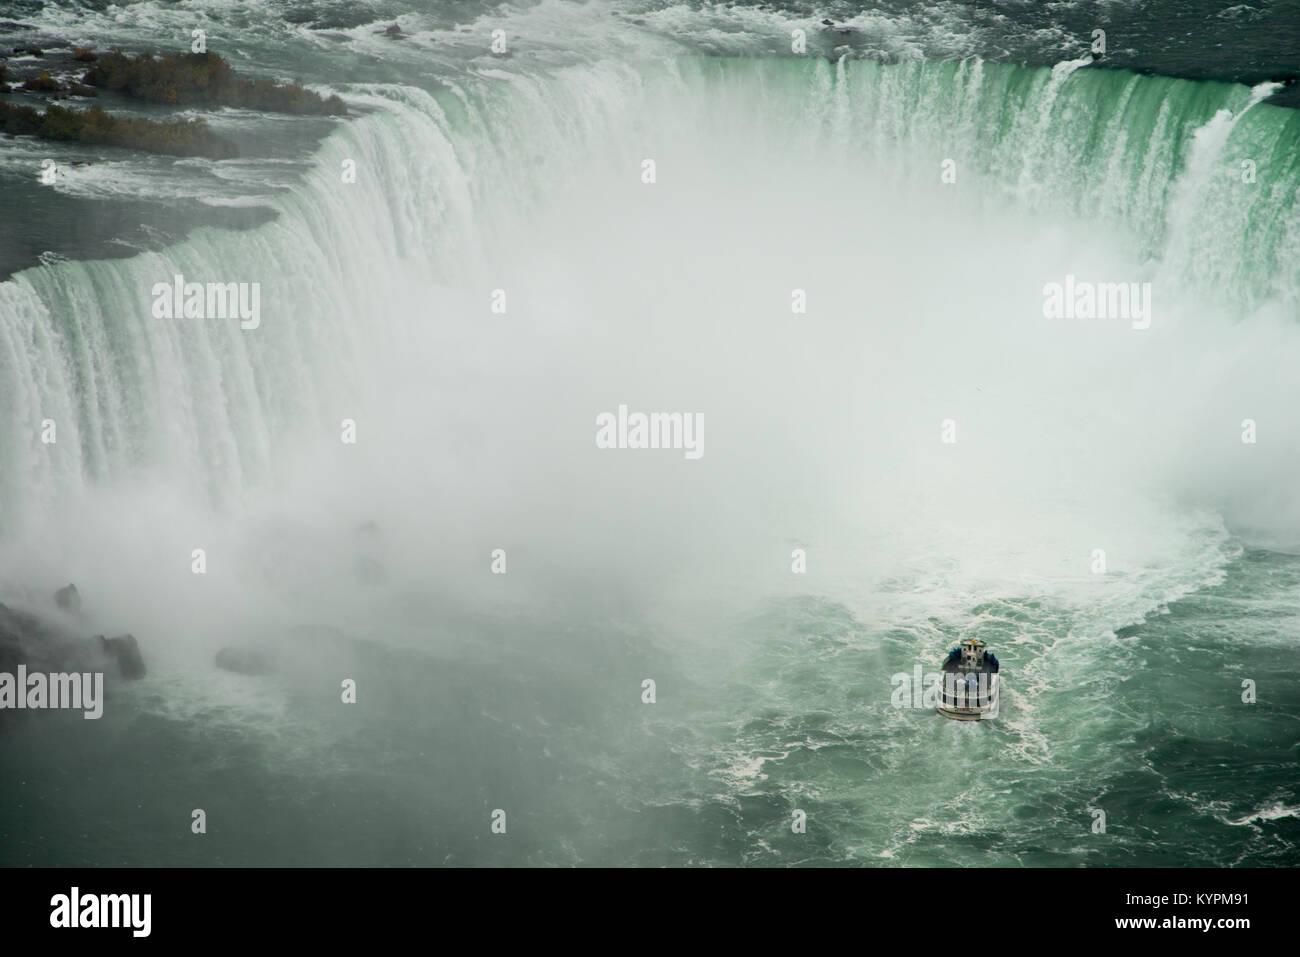 Mädchen des Nebels Ansätze Horseshoe Falls in Niagara Falls, Ontario, Kanada Stockfoto